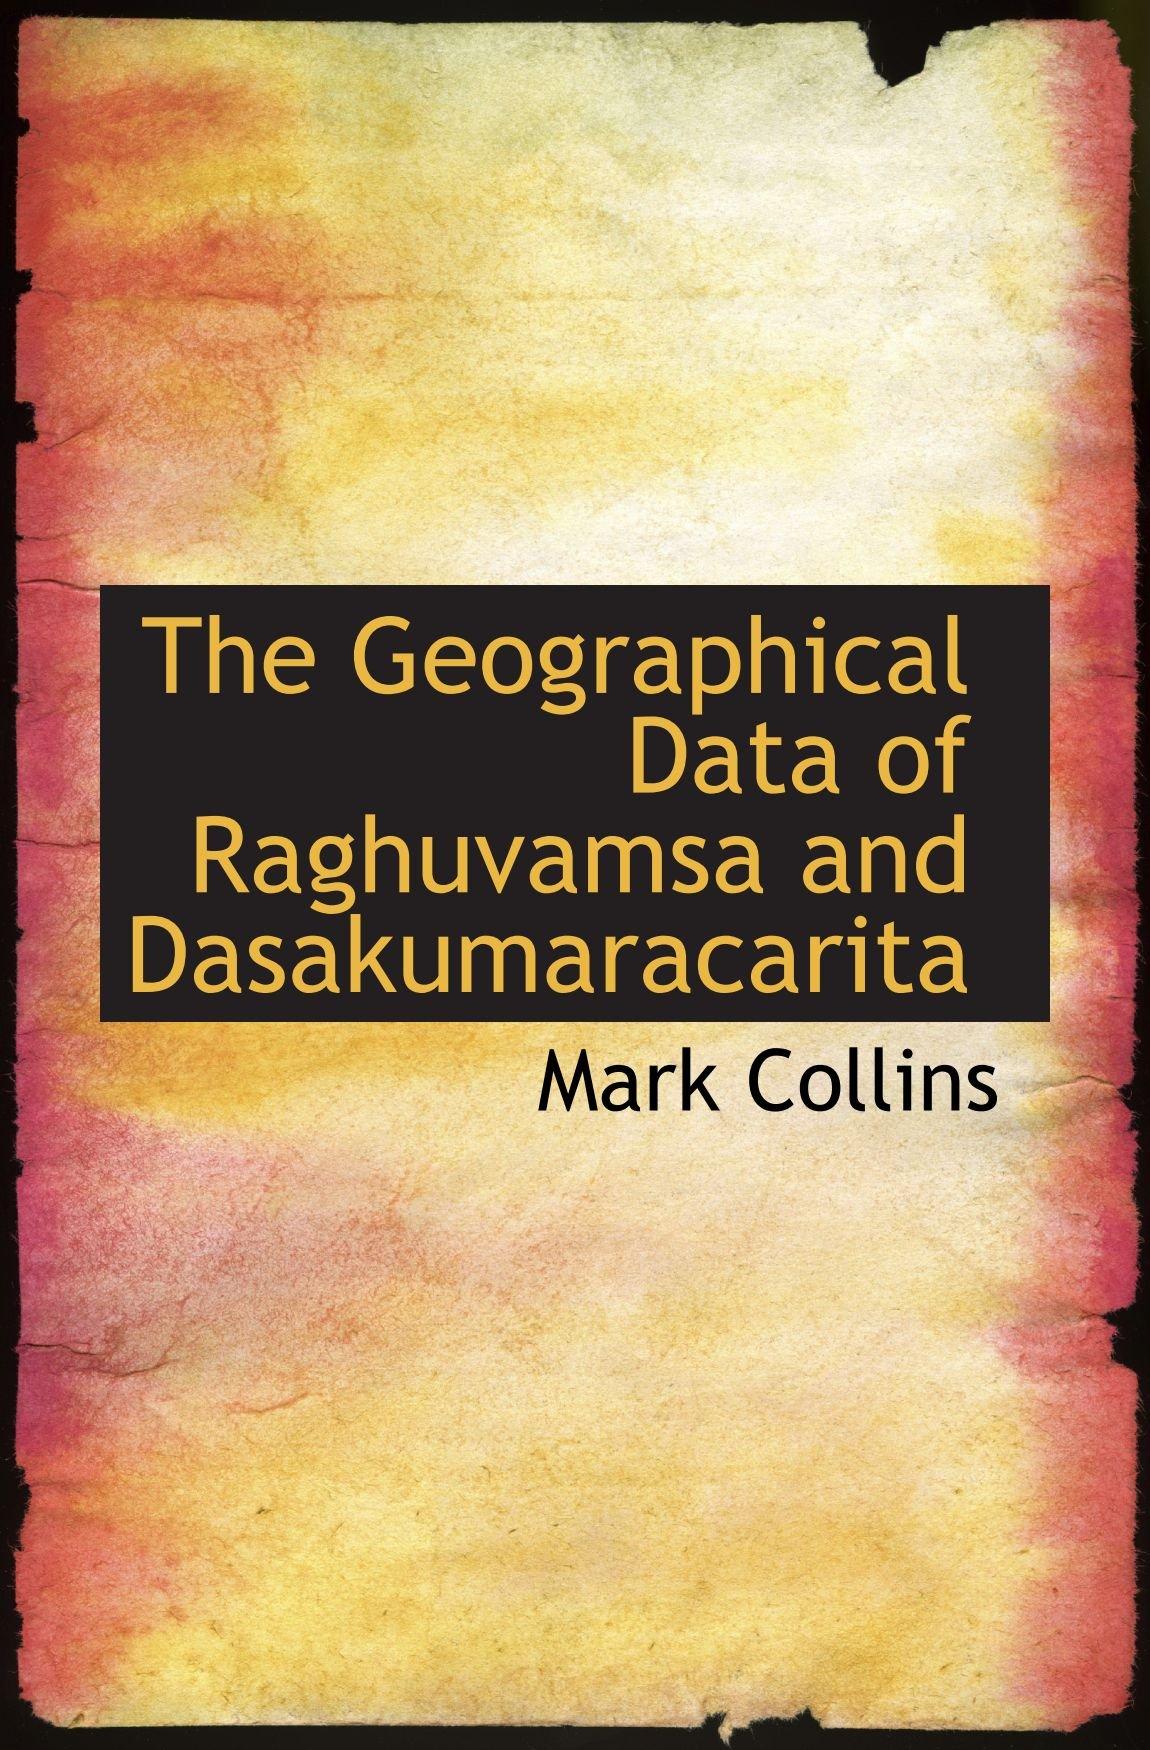 Download The Geographical Data of Raghuvamsa and Dasakumaracarita ebook